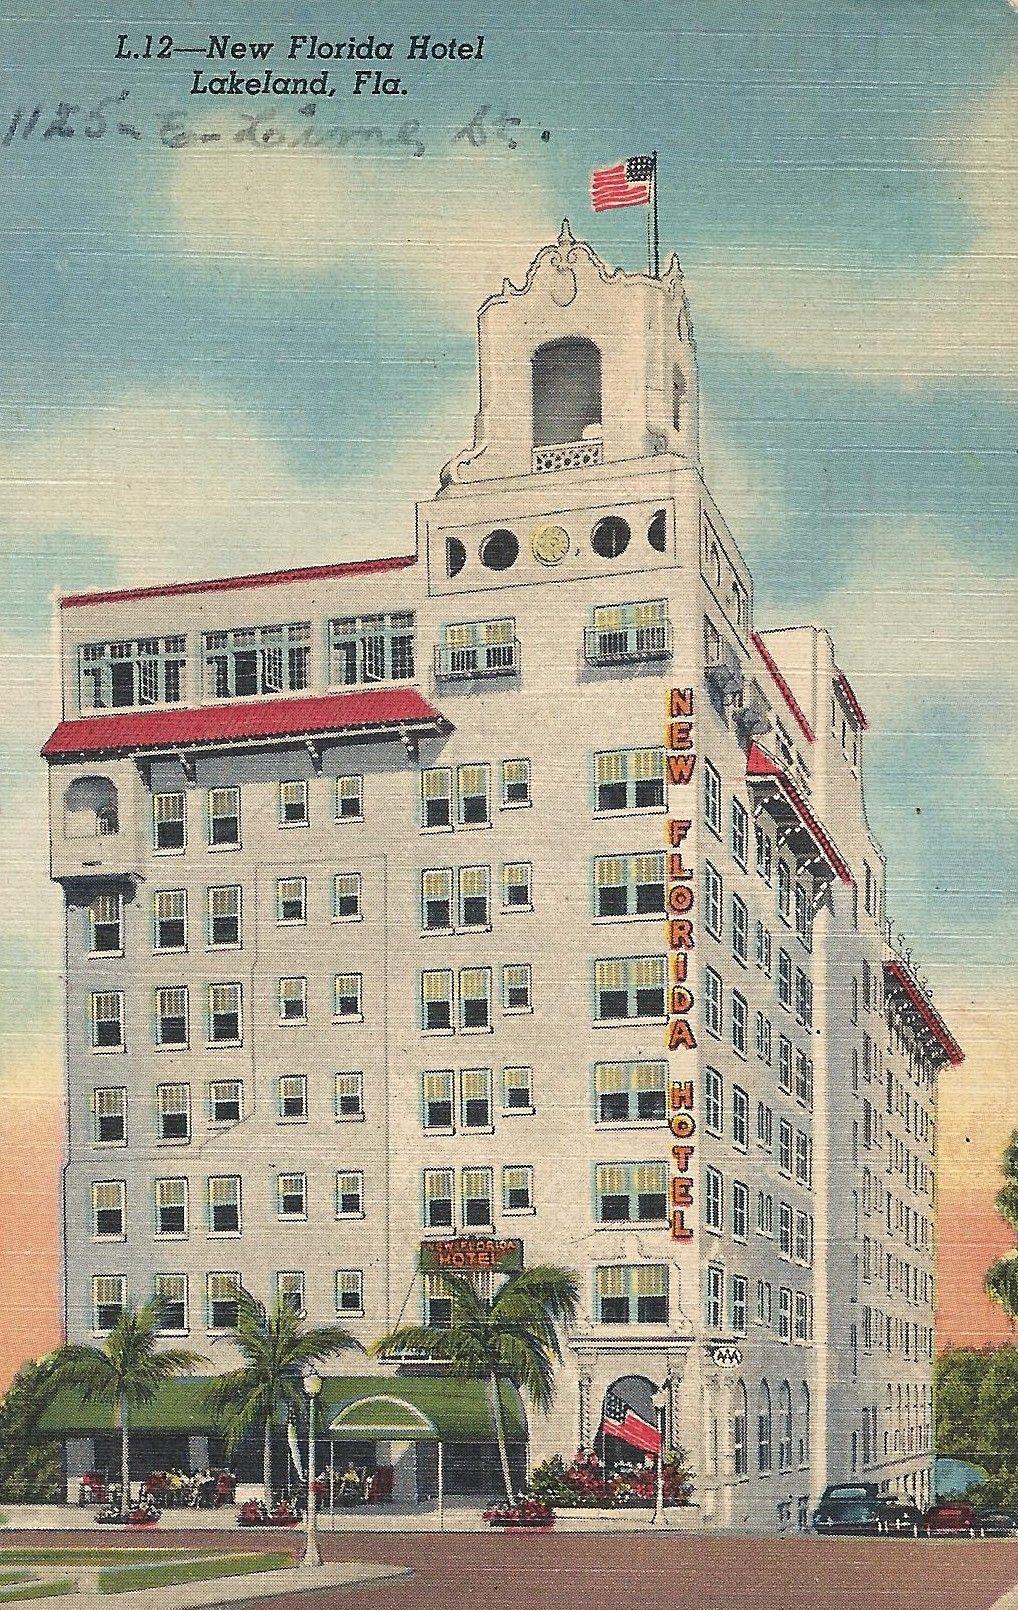 New Florida Hotel Lakeland Postmark Is 1953